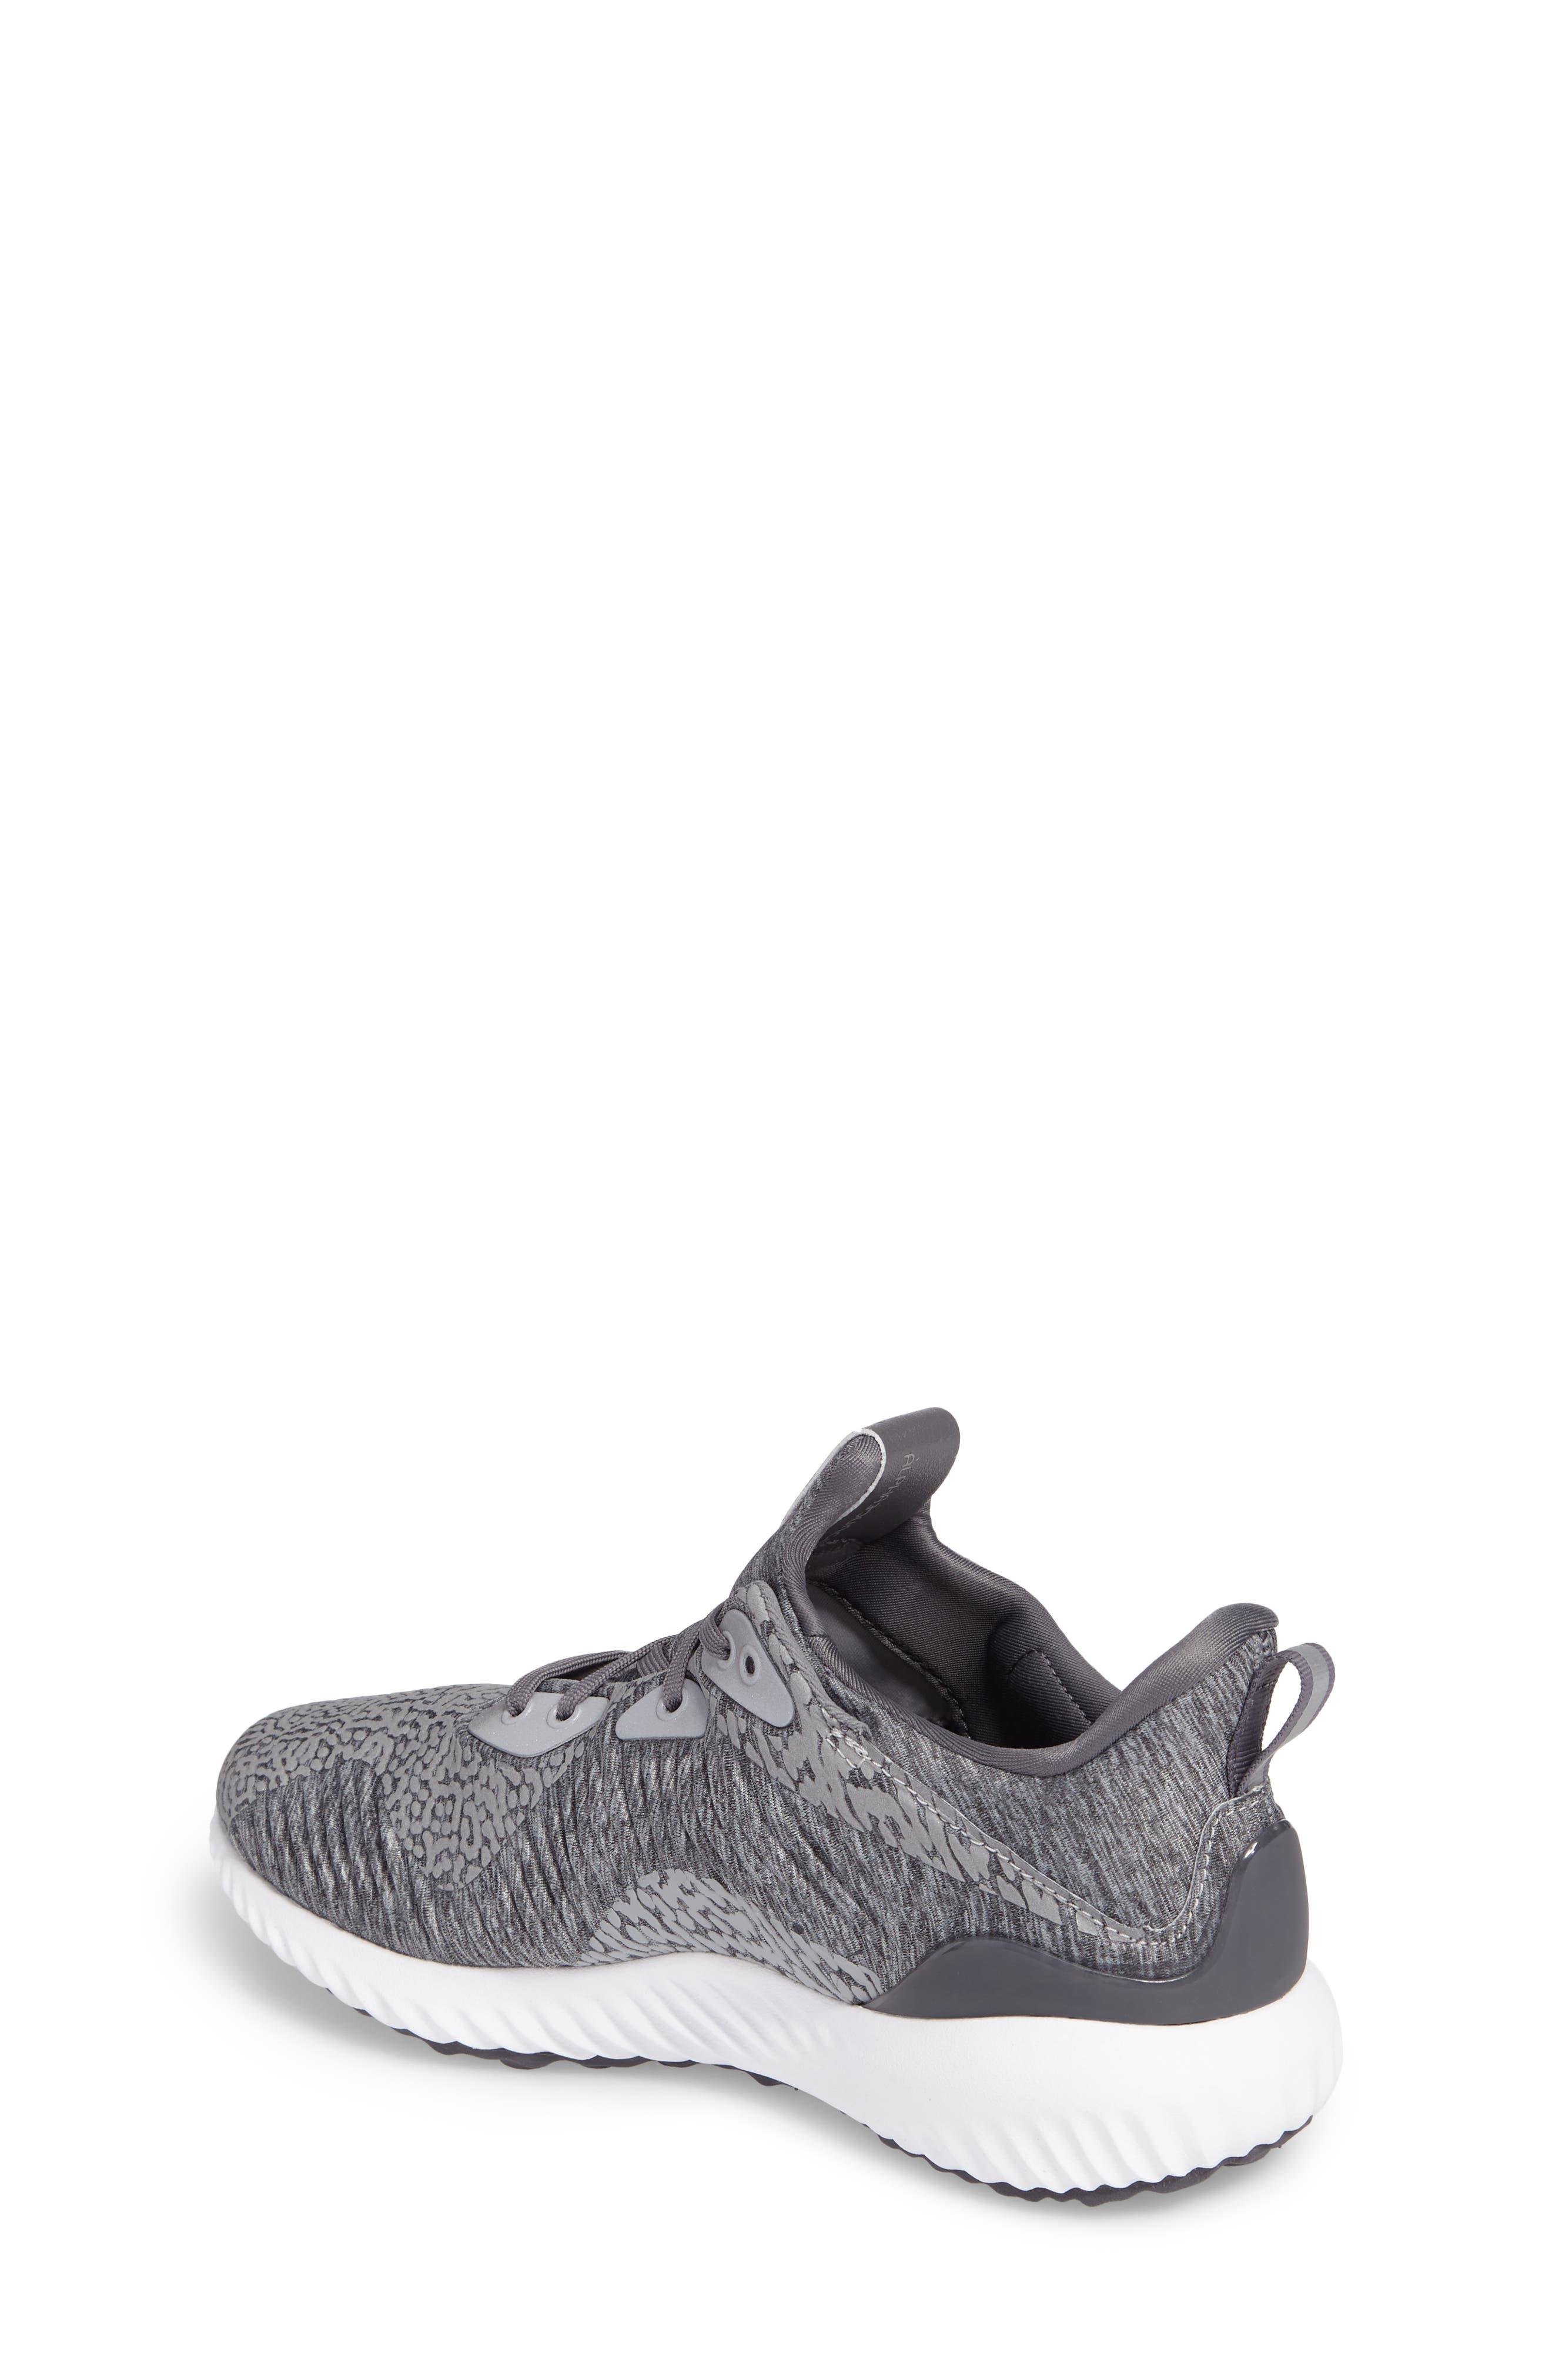 AlphaBounce Sneaker,                             Alternate thumbnail 2, color,                             Medium Grey Heather